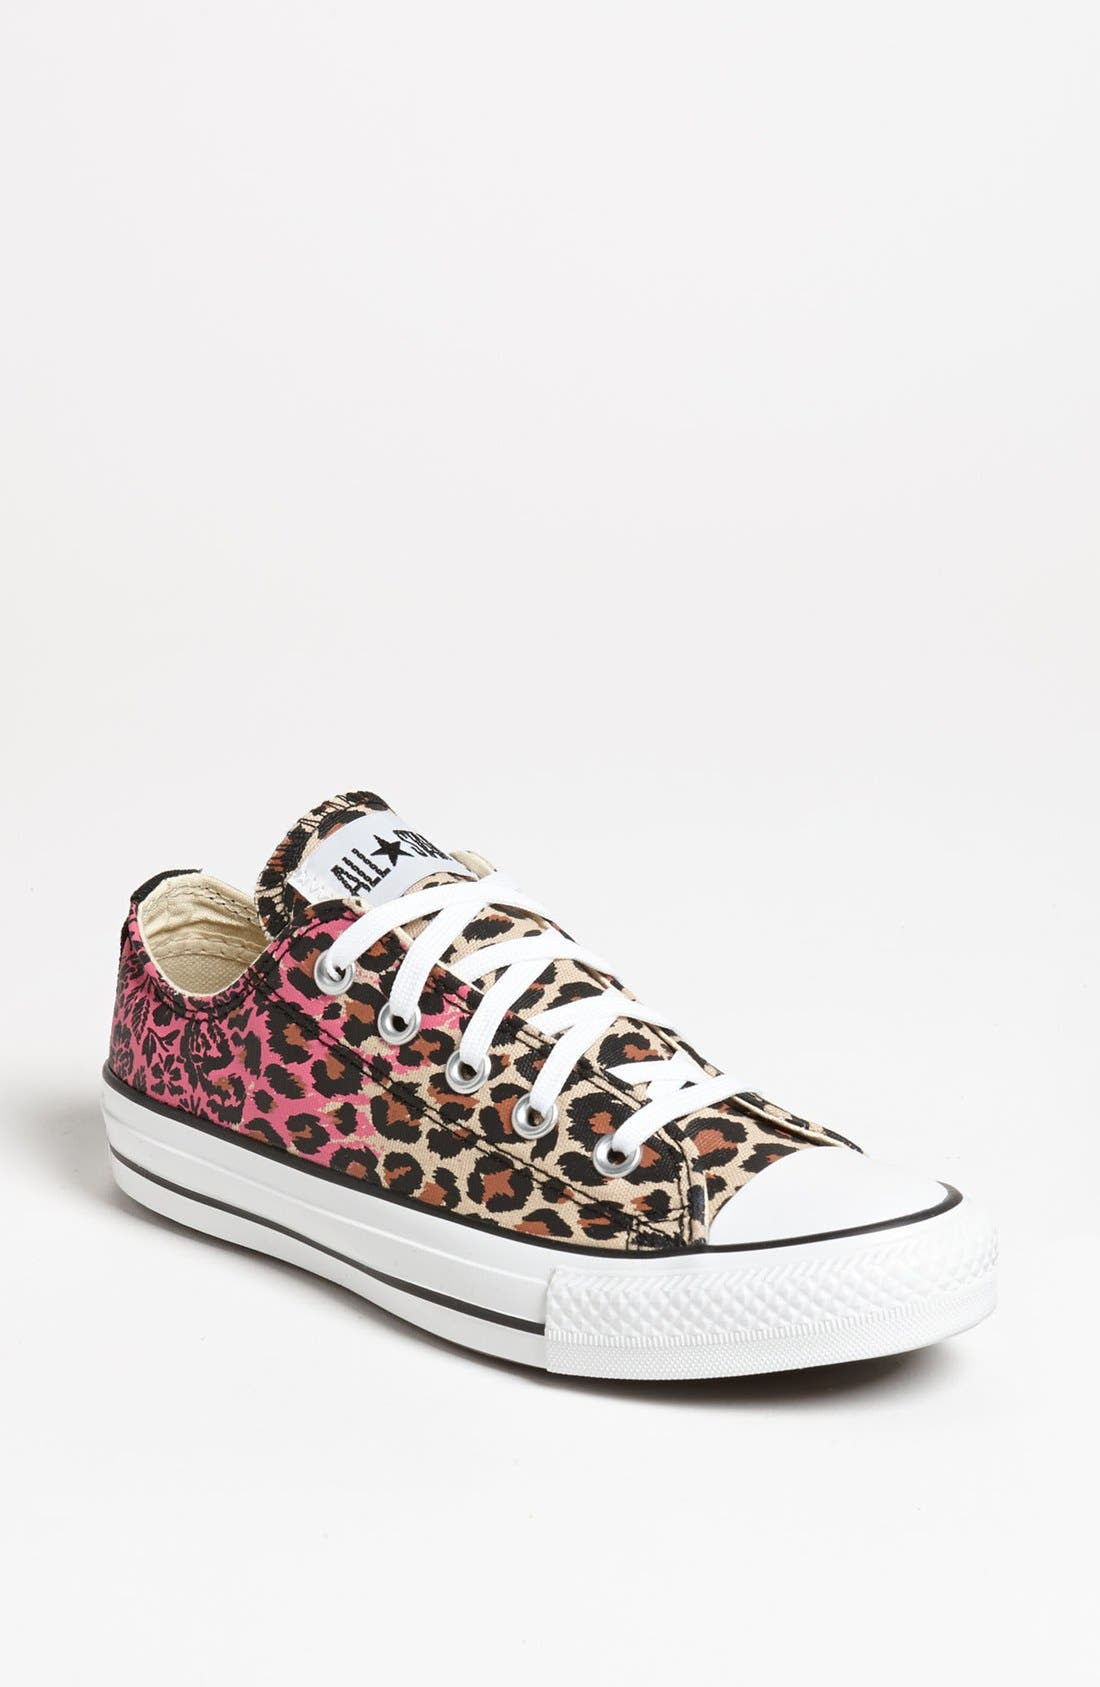 Alternate Image 1 Selected - Converse Chuck Taylor® All Star® Animal Print Sneaker (Women)